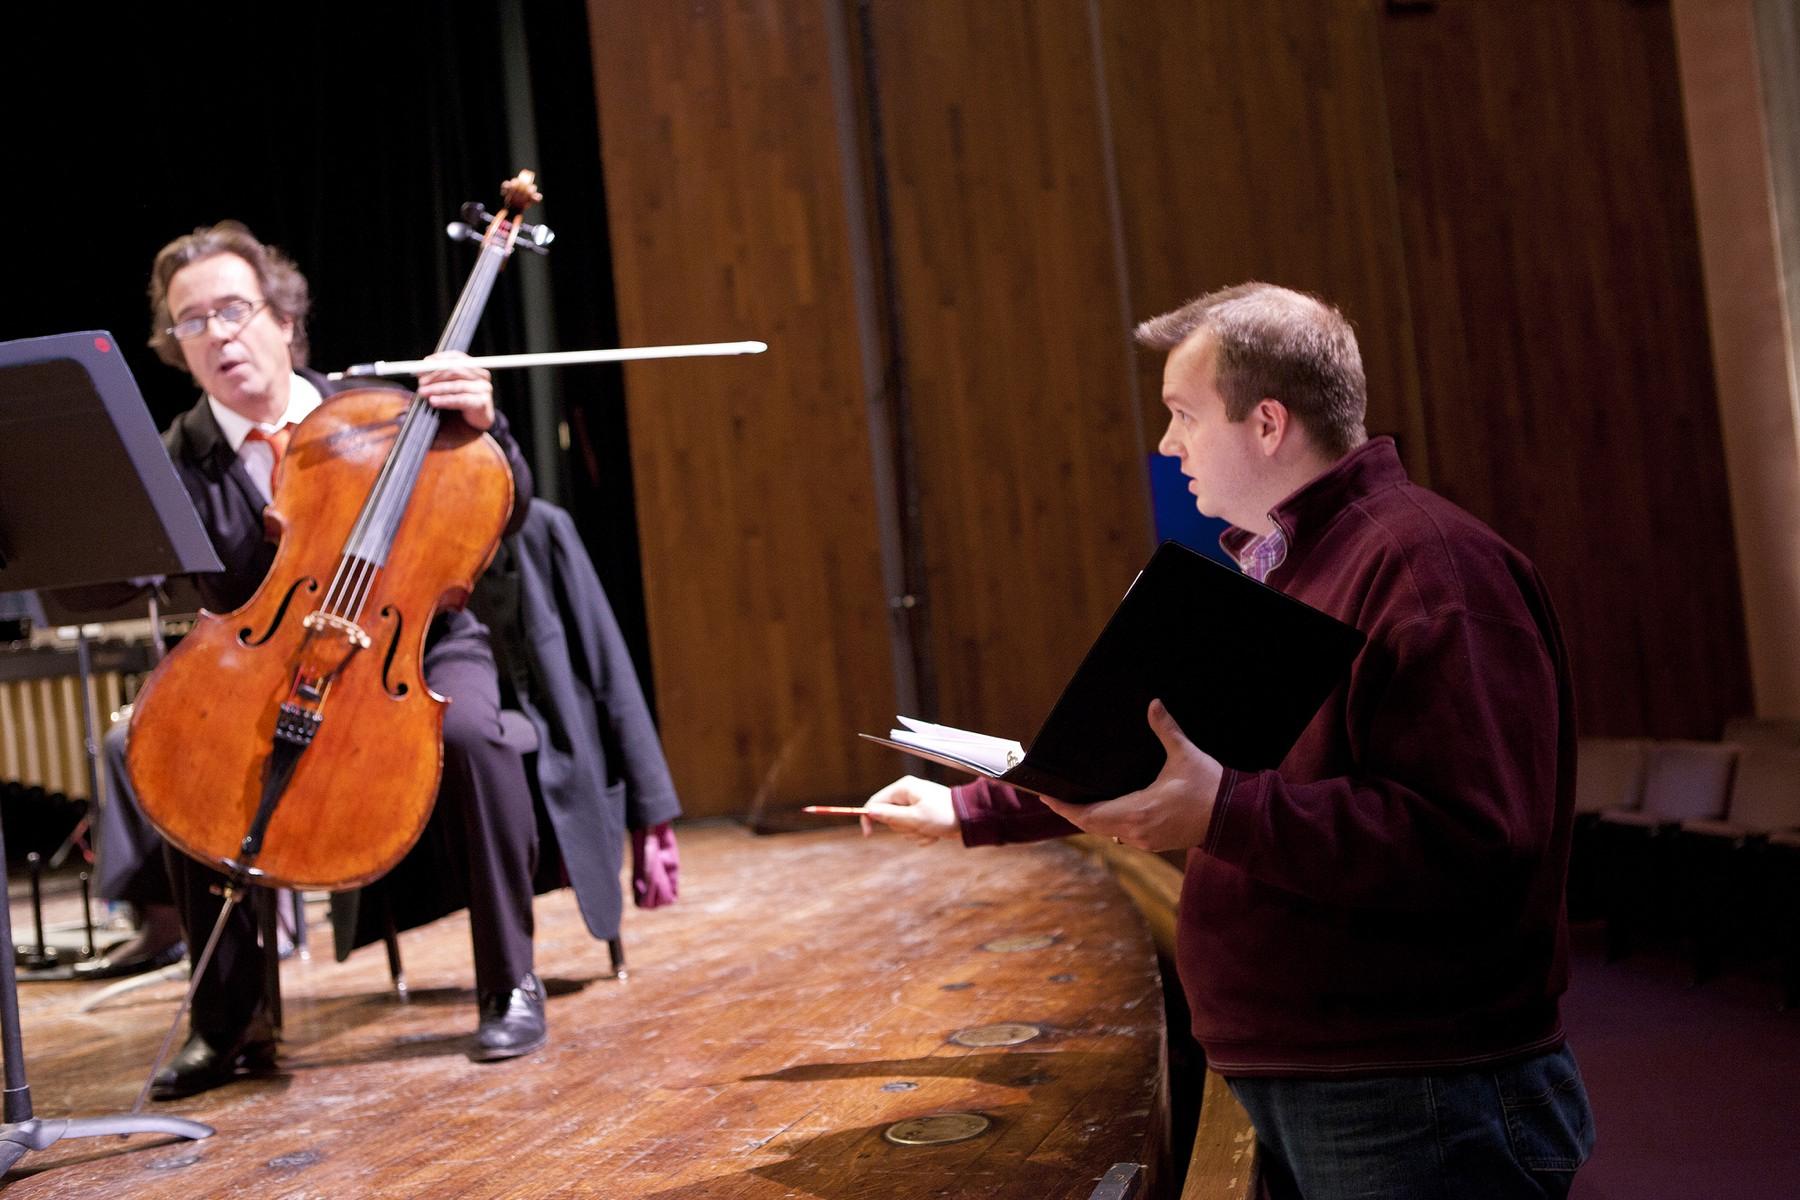 2012, Washington National Opera